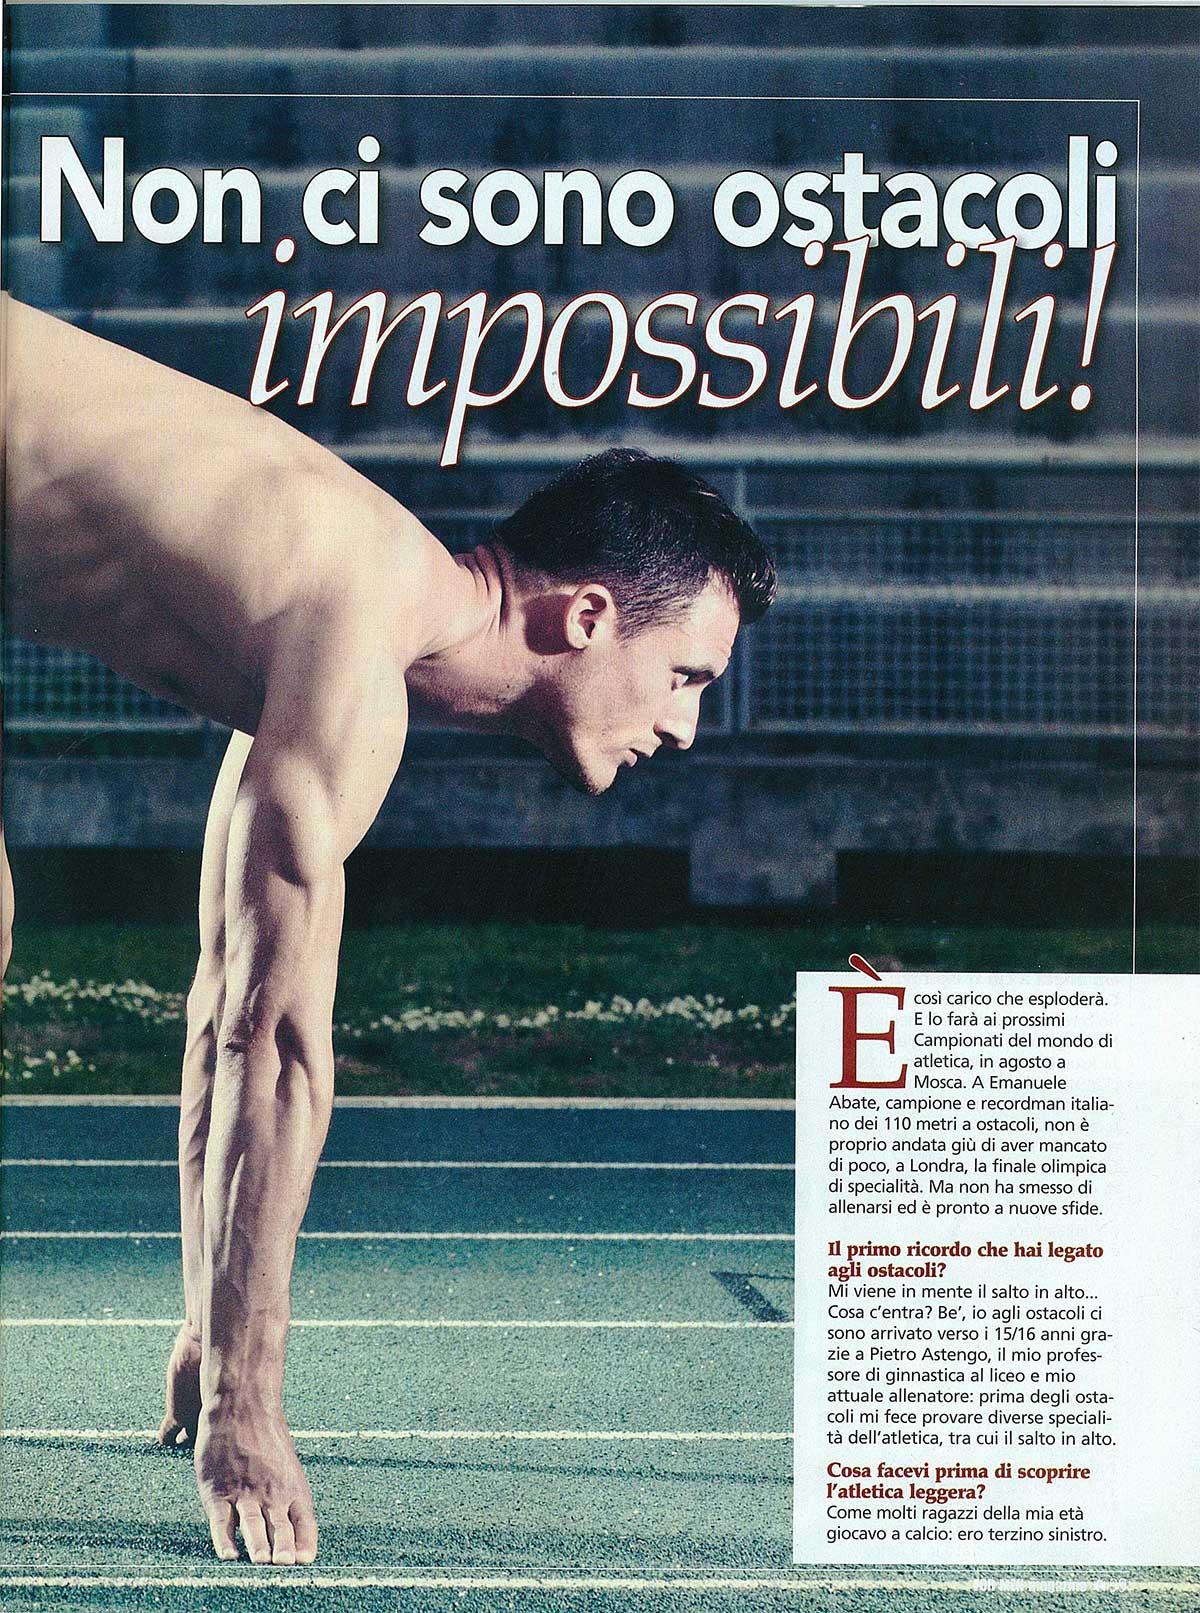 Emanuele Abate - Fiamme Oro AtleticaEmanuele Abate - Fiamme Oro Atletica